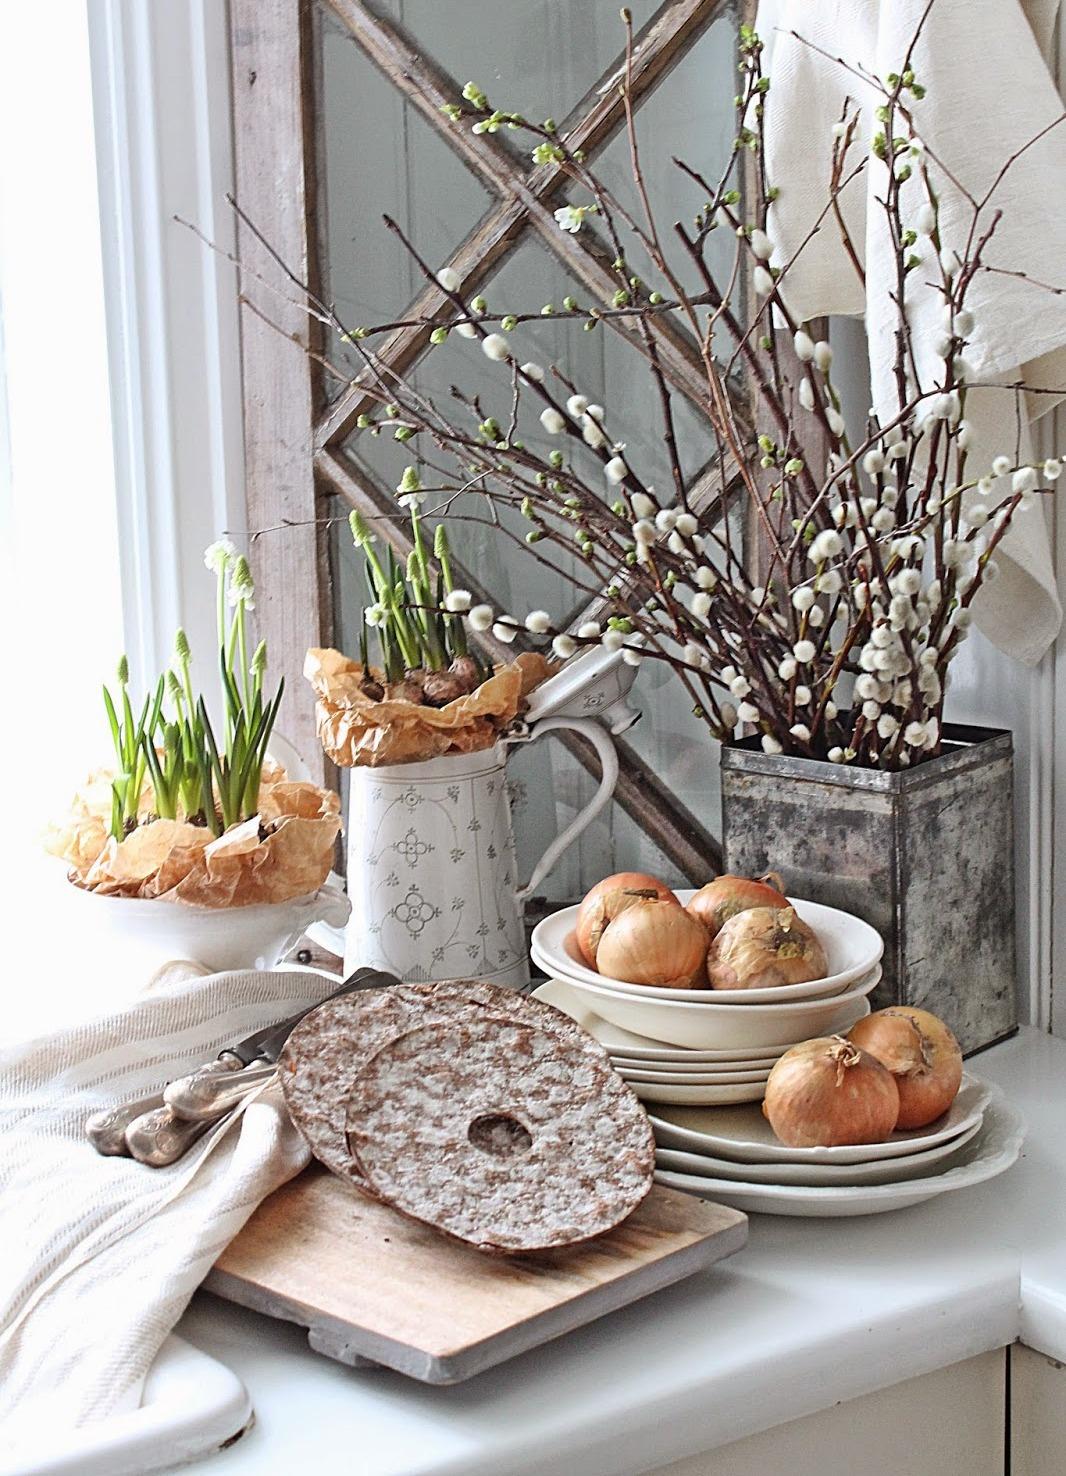 dekor/vesennii-dekor-svoimi-rukami-foto-6.jpg